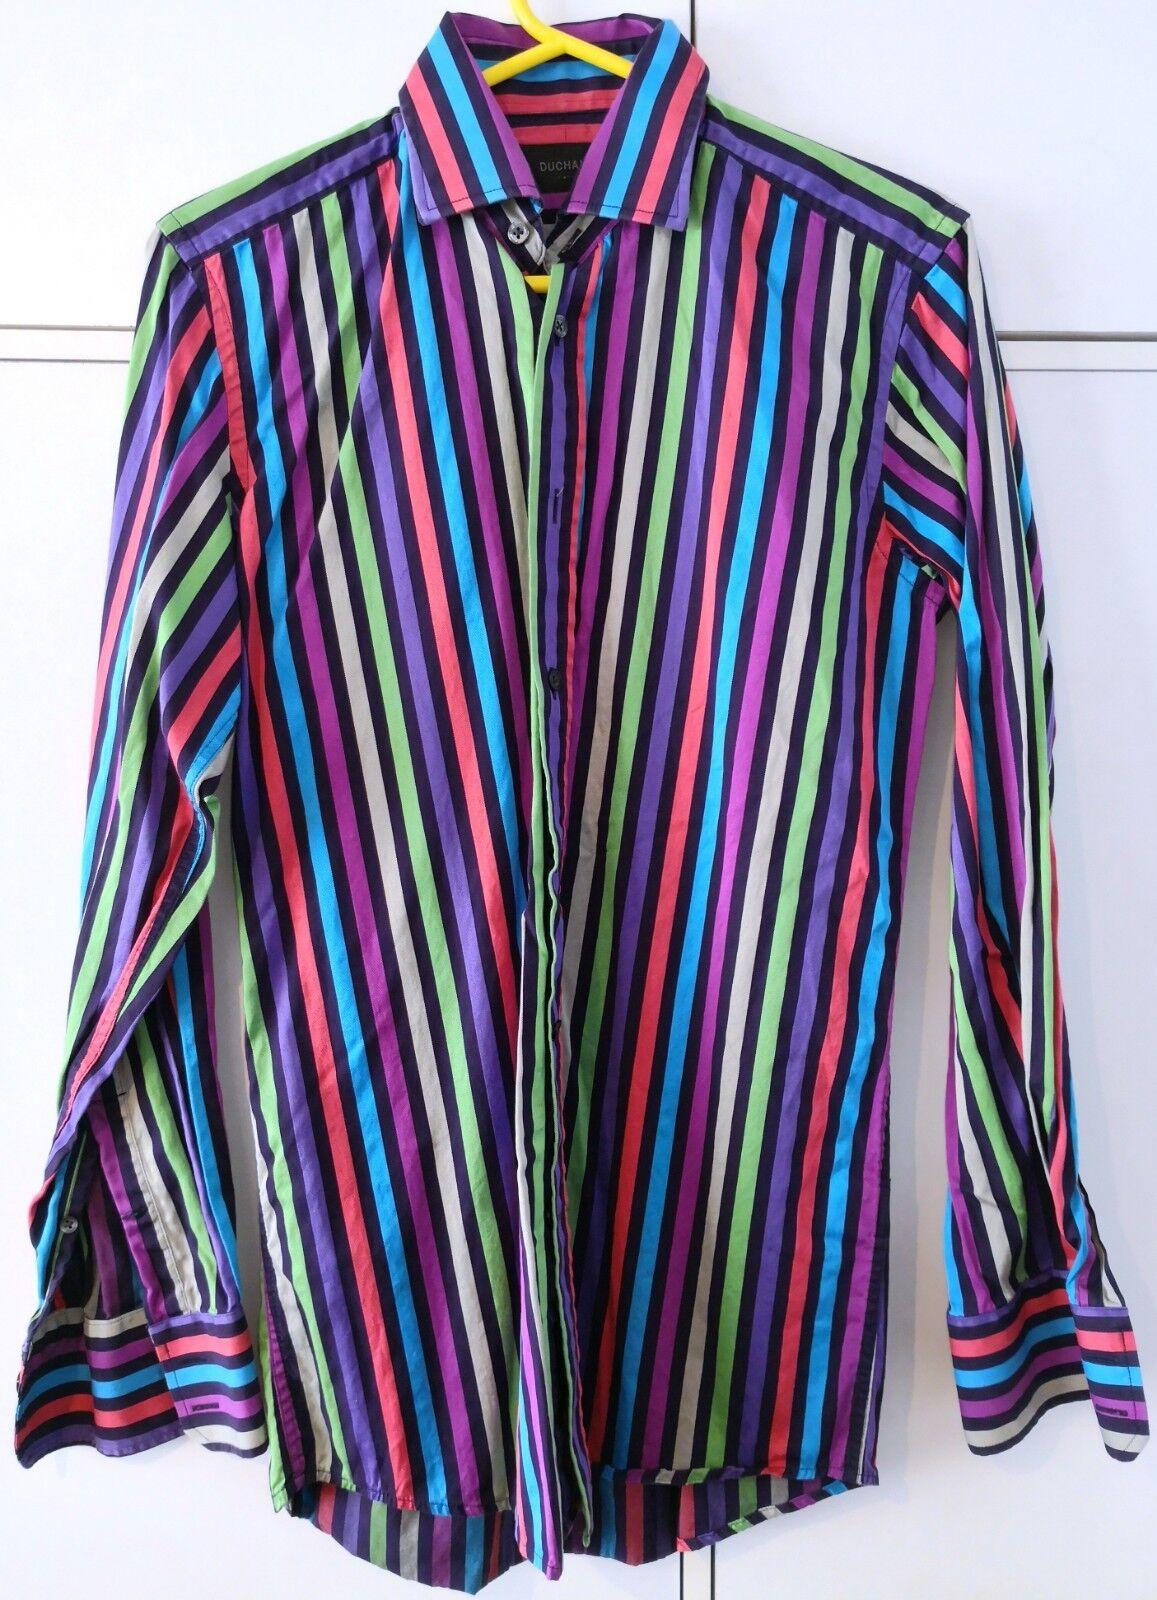 Duchamp London - Multi Coloured Striped Shirt 14.5 - DARK PURPLE - WORN ONCE